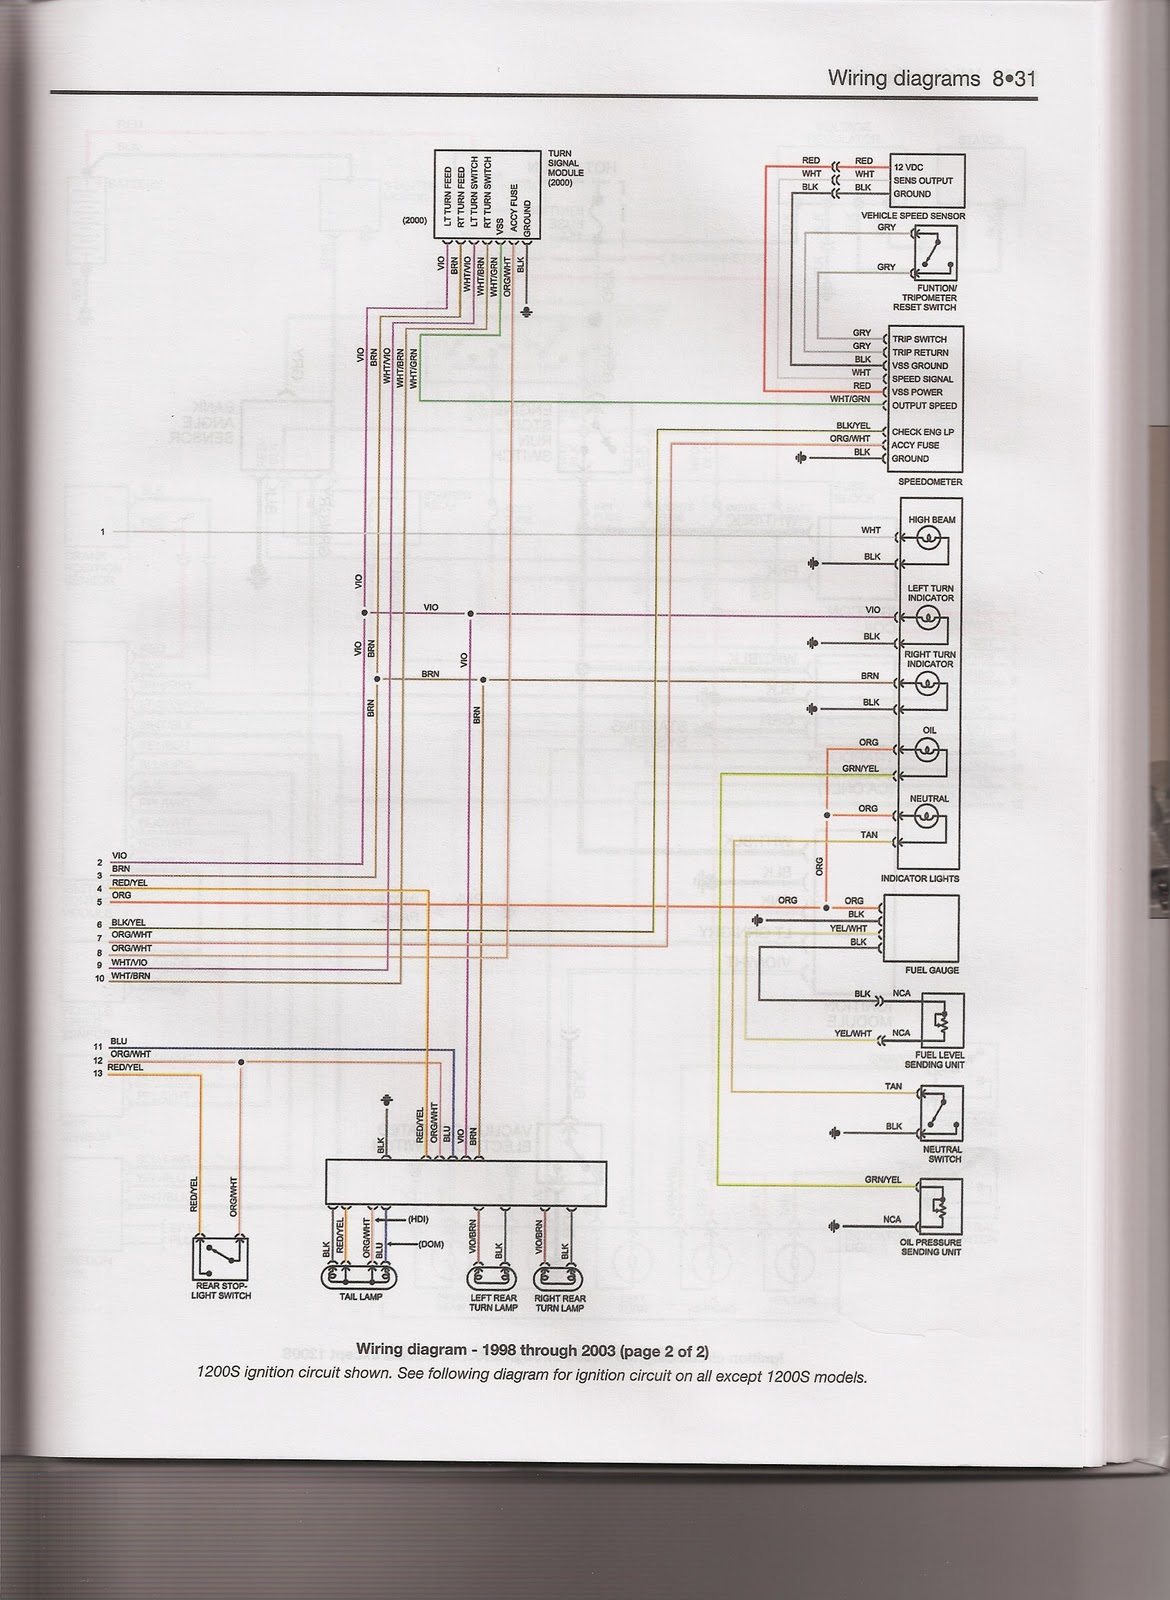 YH_2849 For A Harley Ironhead Xlch Wiring Diagram Schematic Wiring [ 1600 x 1170 Pixel ]